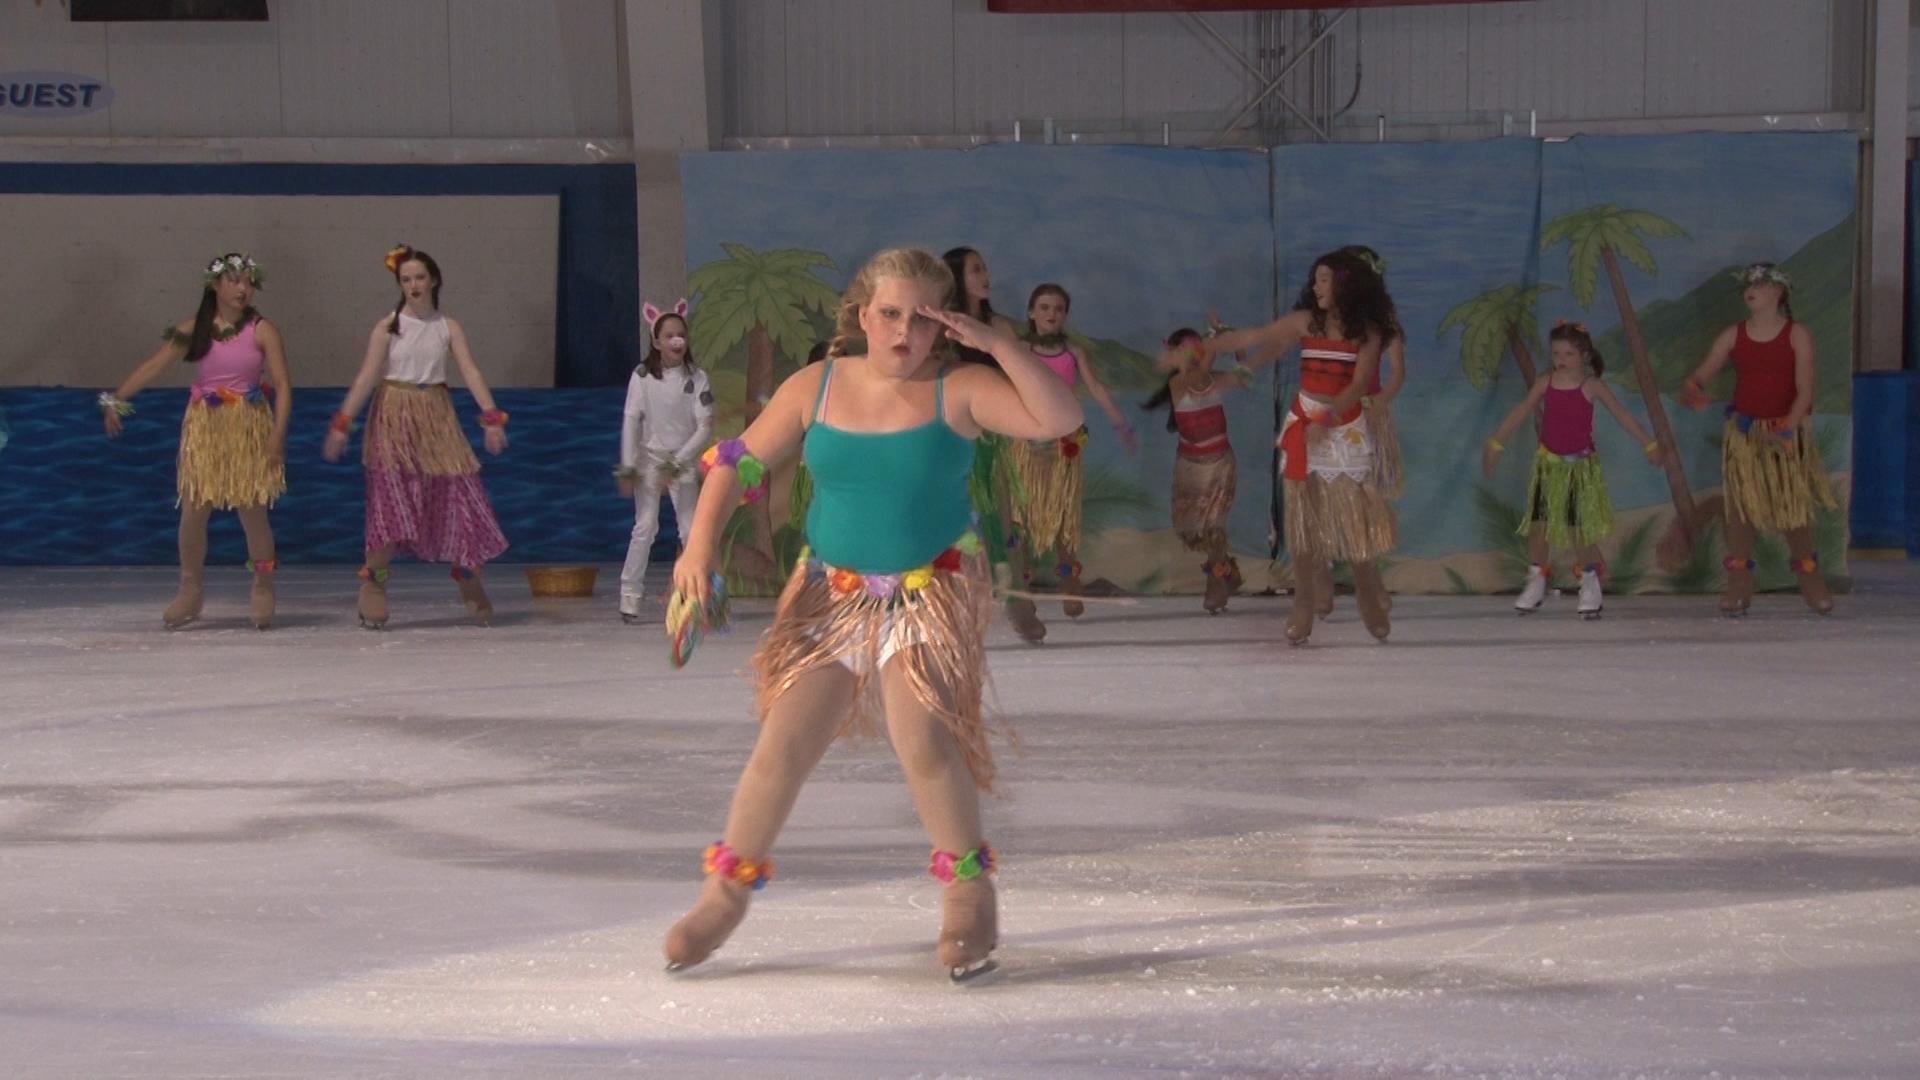 Power Play Maui Skate on Ice 071417.00_13_27_06.Still024.jpg